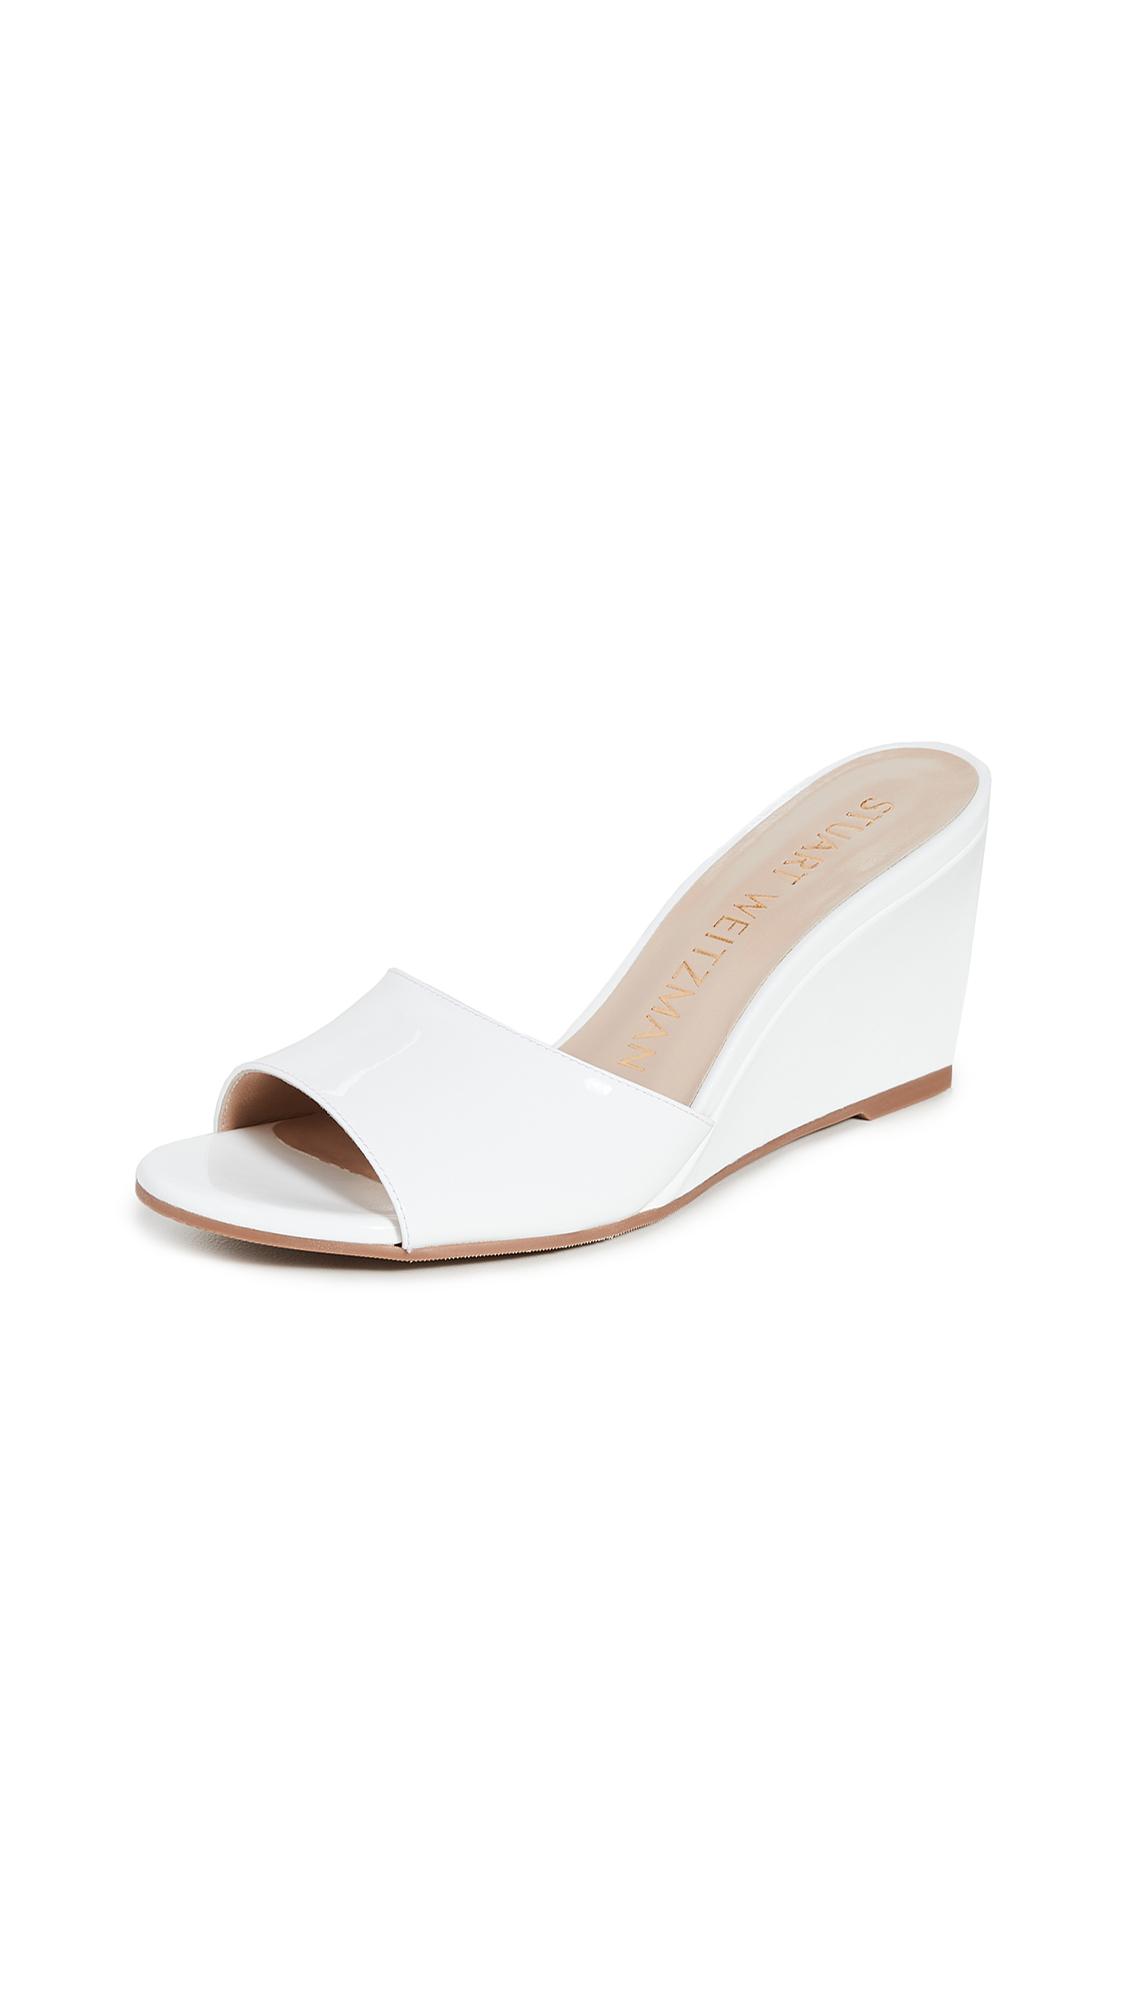 Stuart Weitzman Larunda Wedge Sandals - White